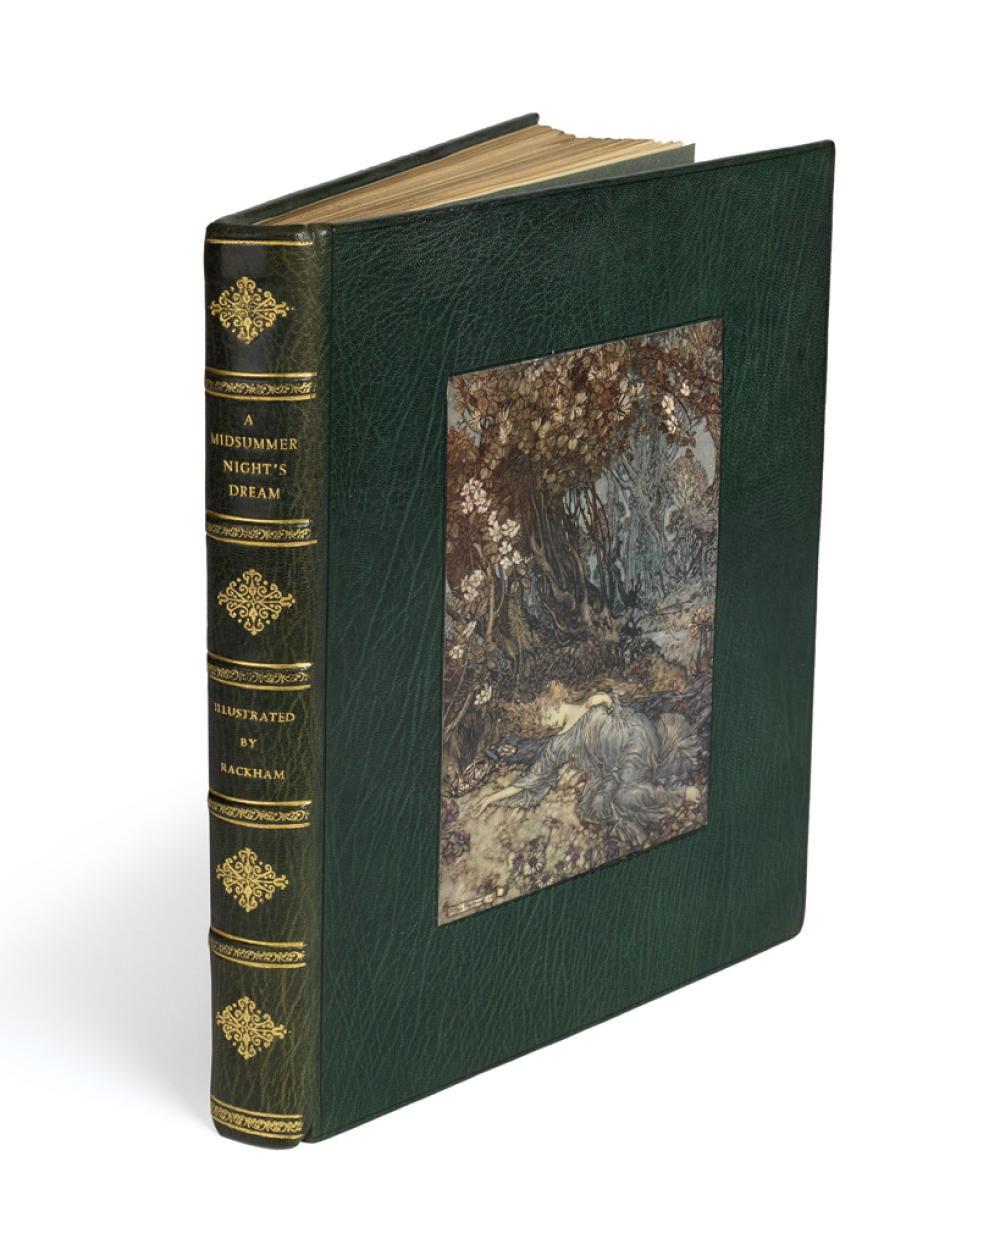 (RACKHAM, ARTHUR.) Shakespeare, William. A Midsummer Night''s Dream.